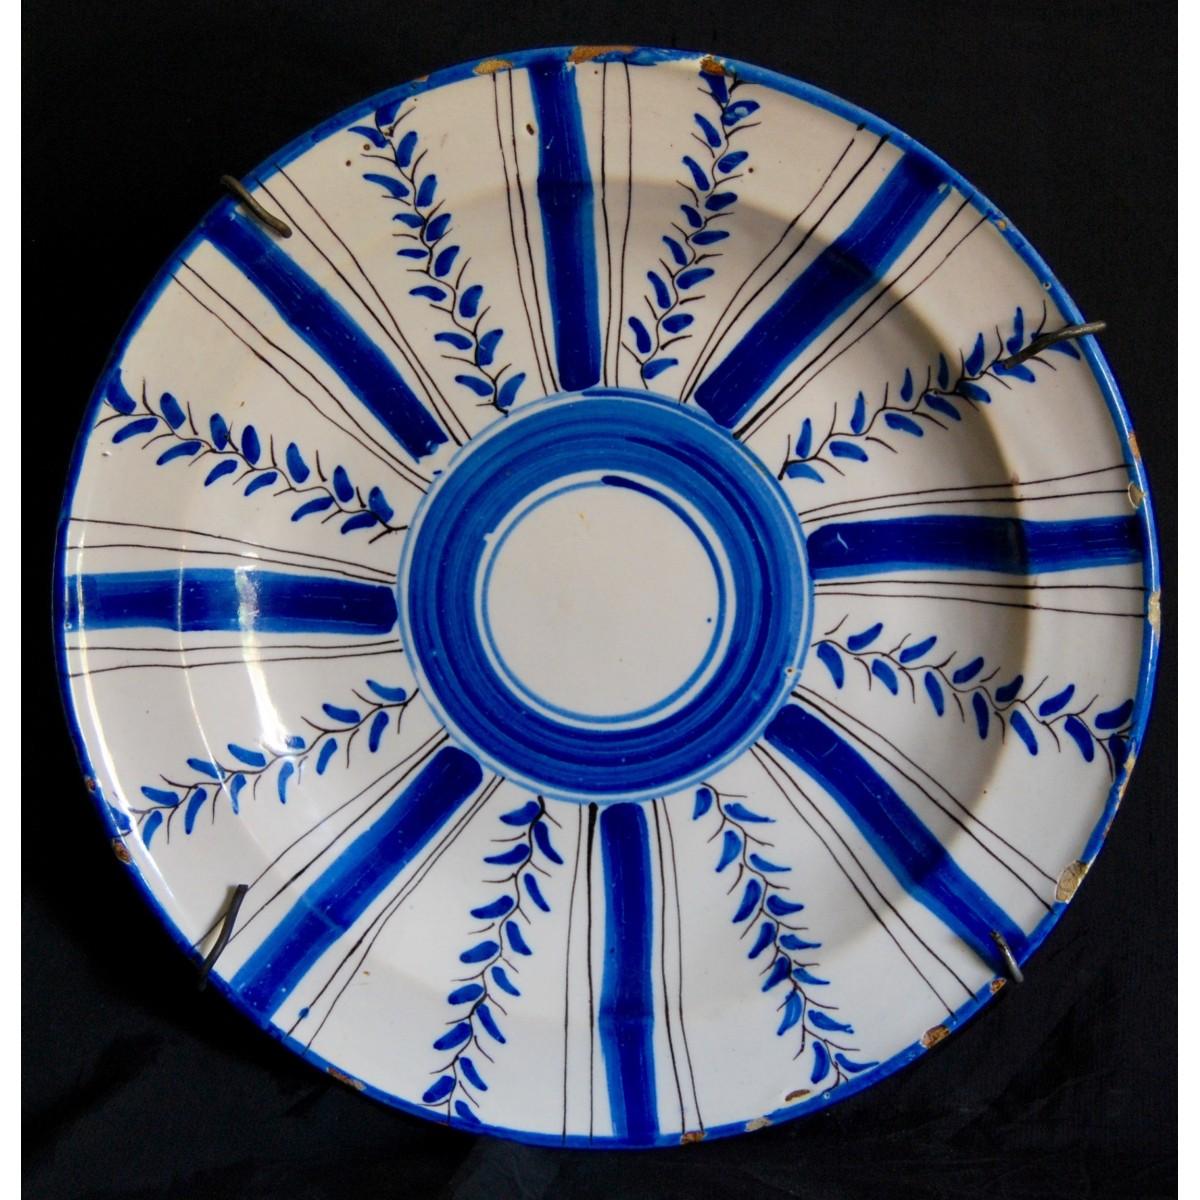 Plato cerámica del siglo XIX, Manises (Valencia)